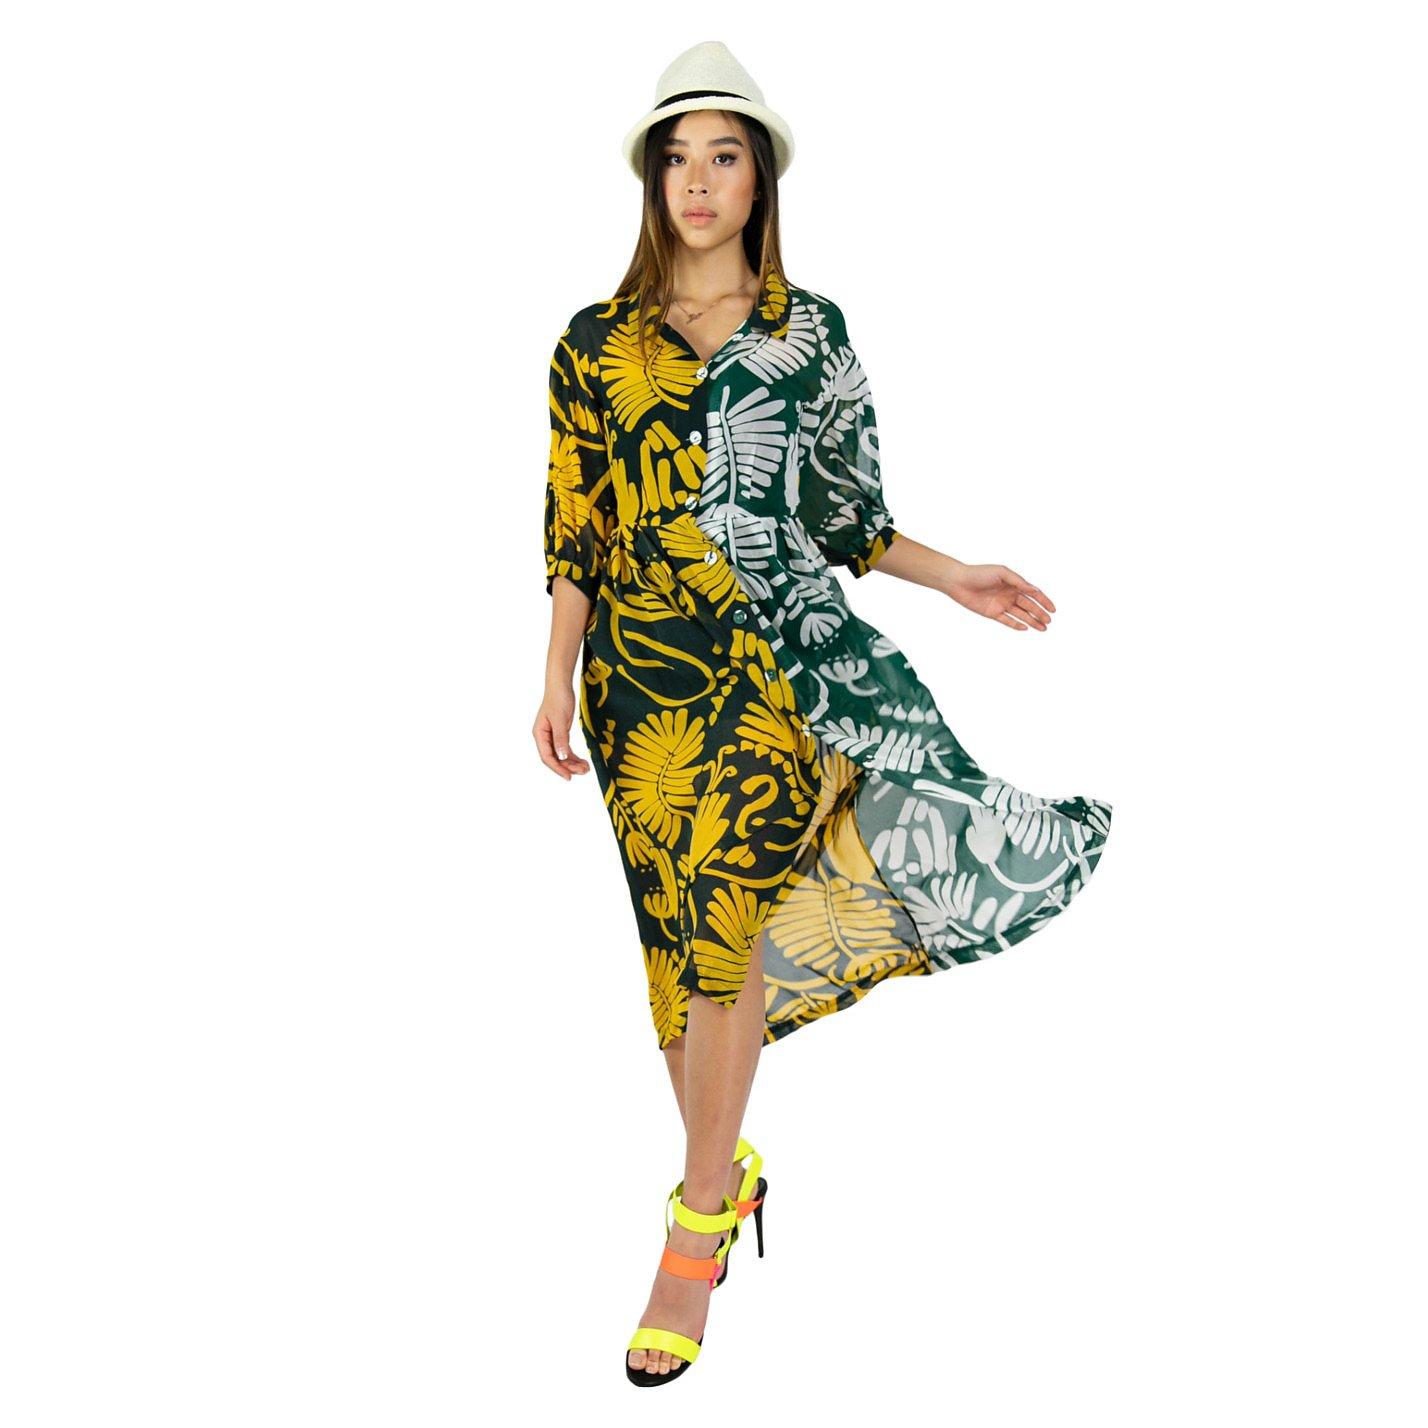 Syra J Contrast Panel Dress